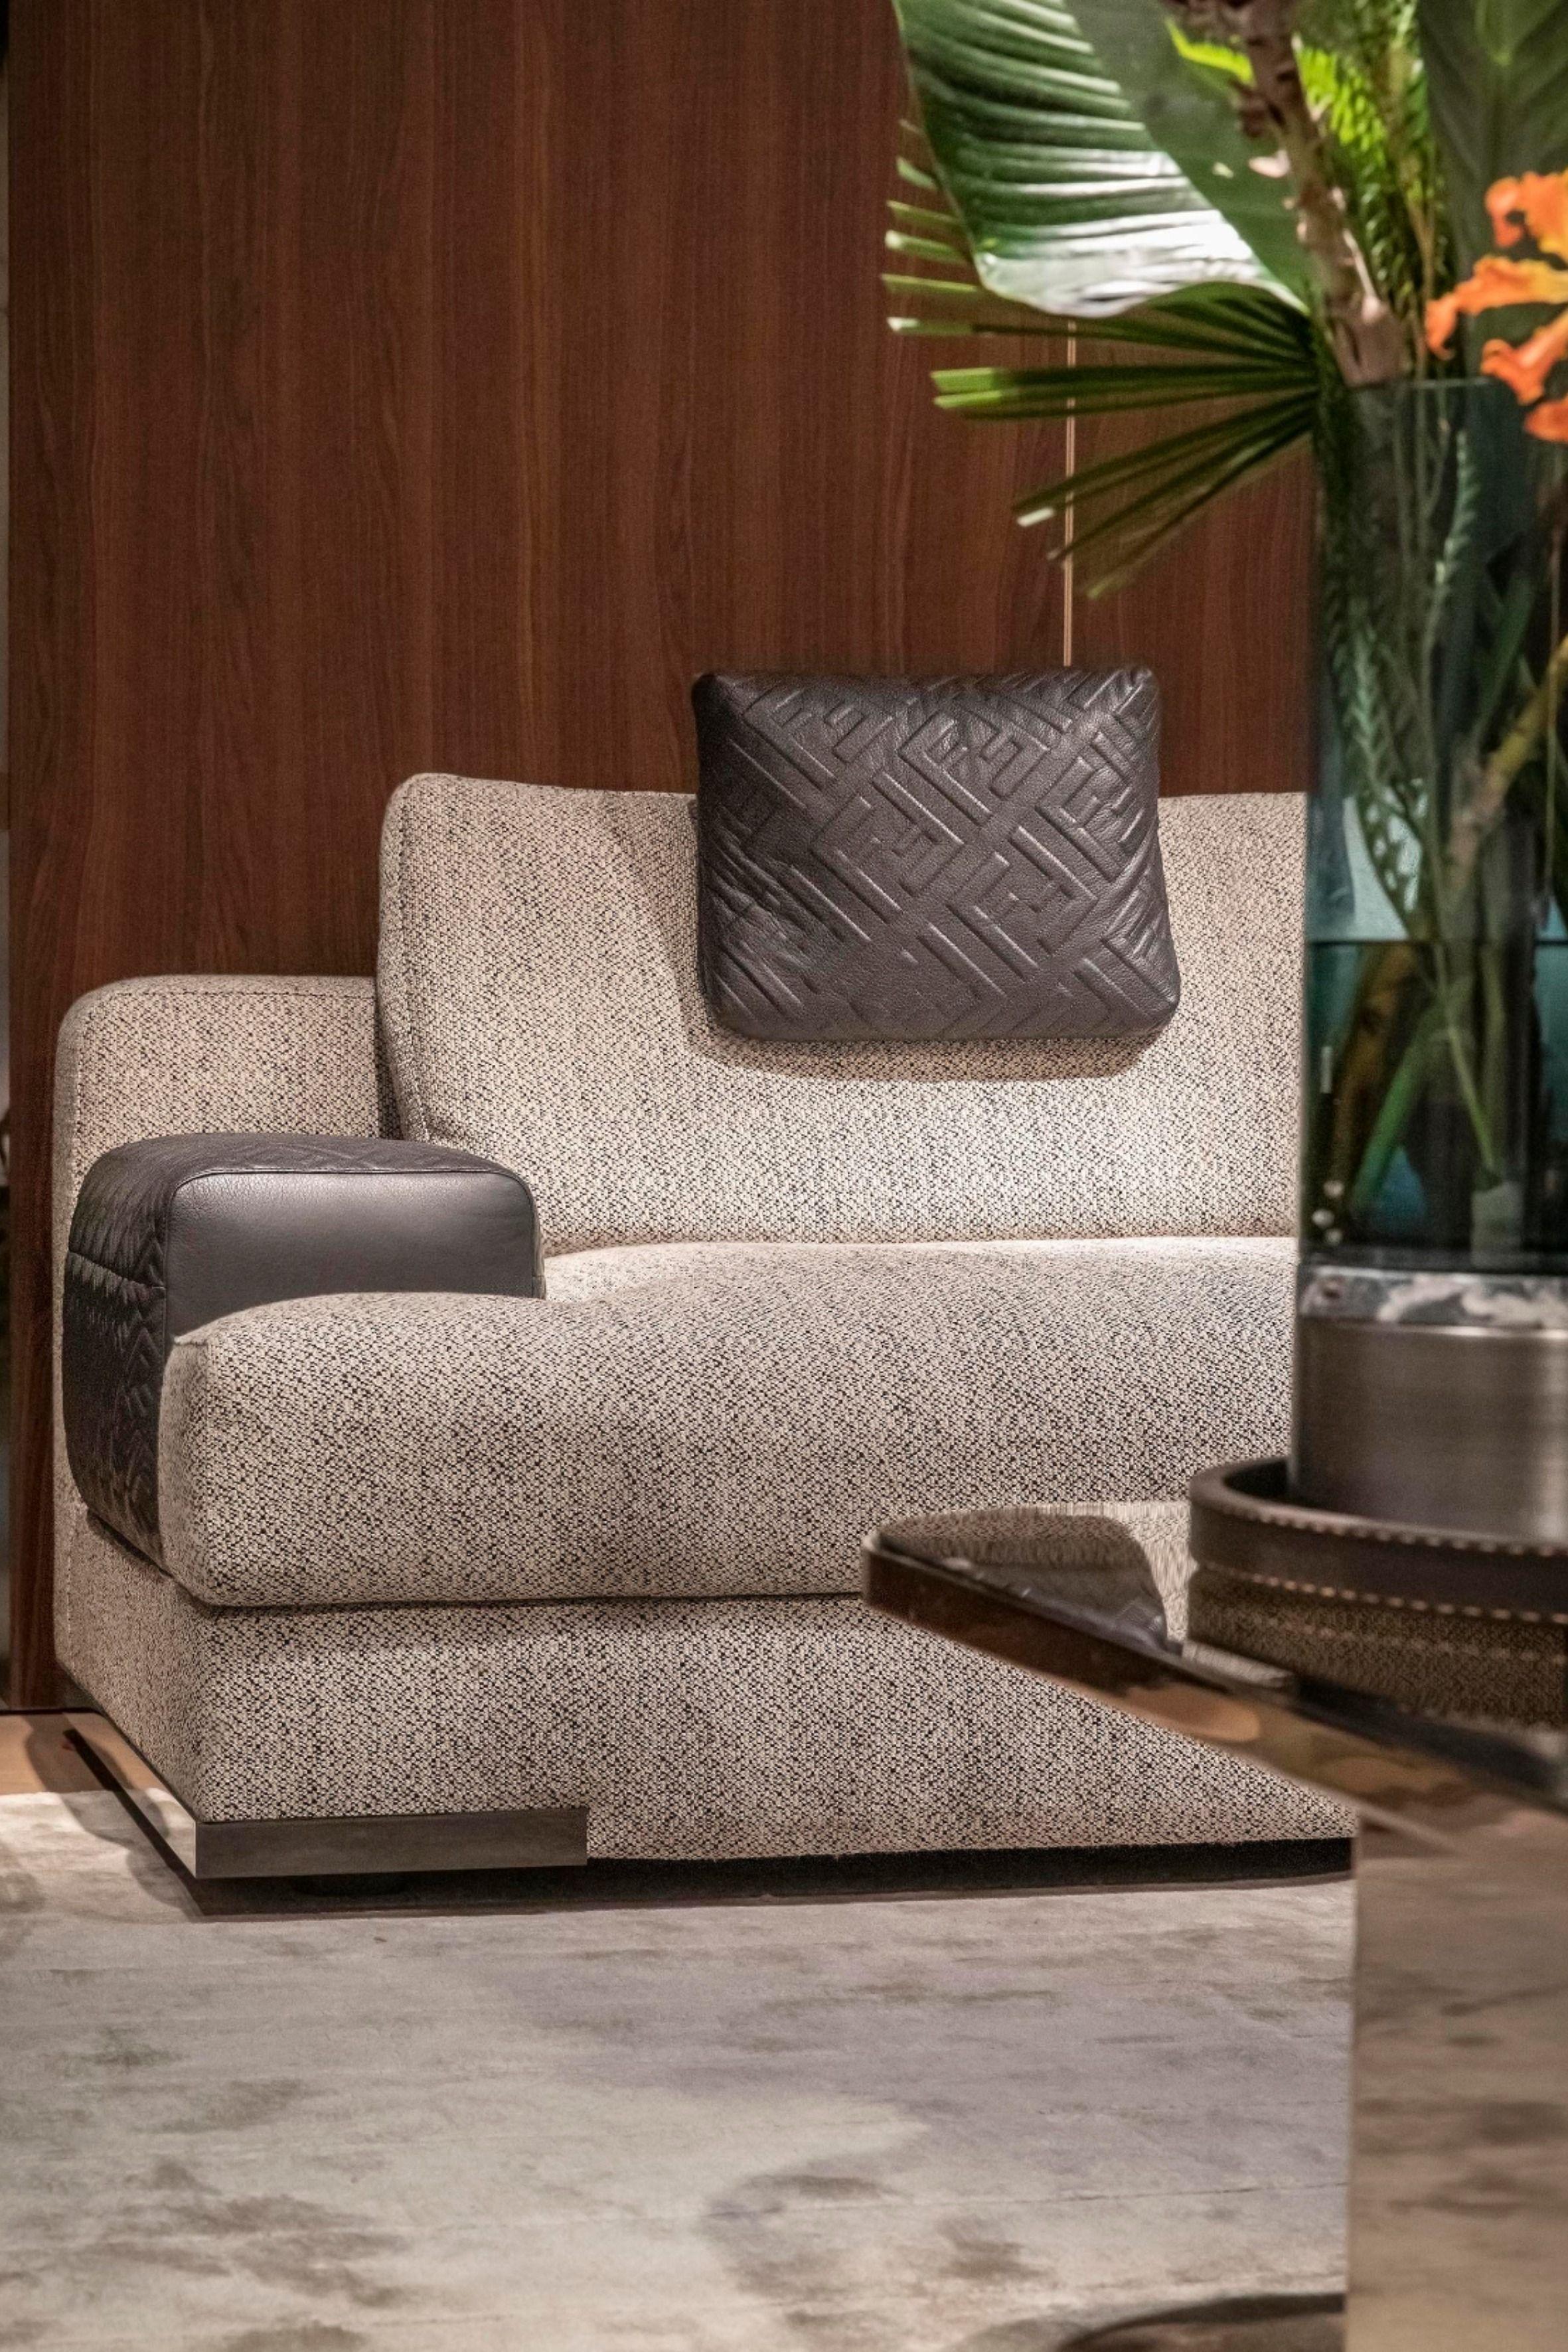 #sofa #Fendi #luxuryfurniture #interiordesign #LuxuryLivingGroup